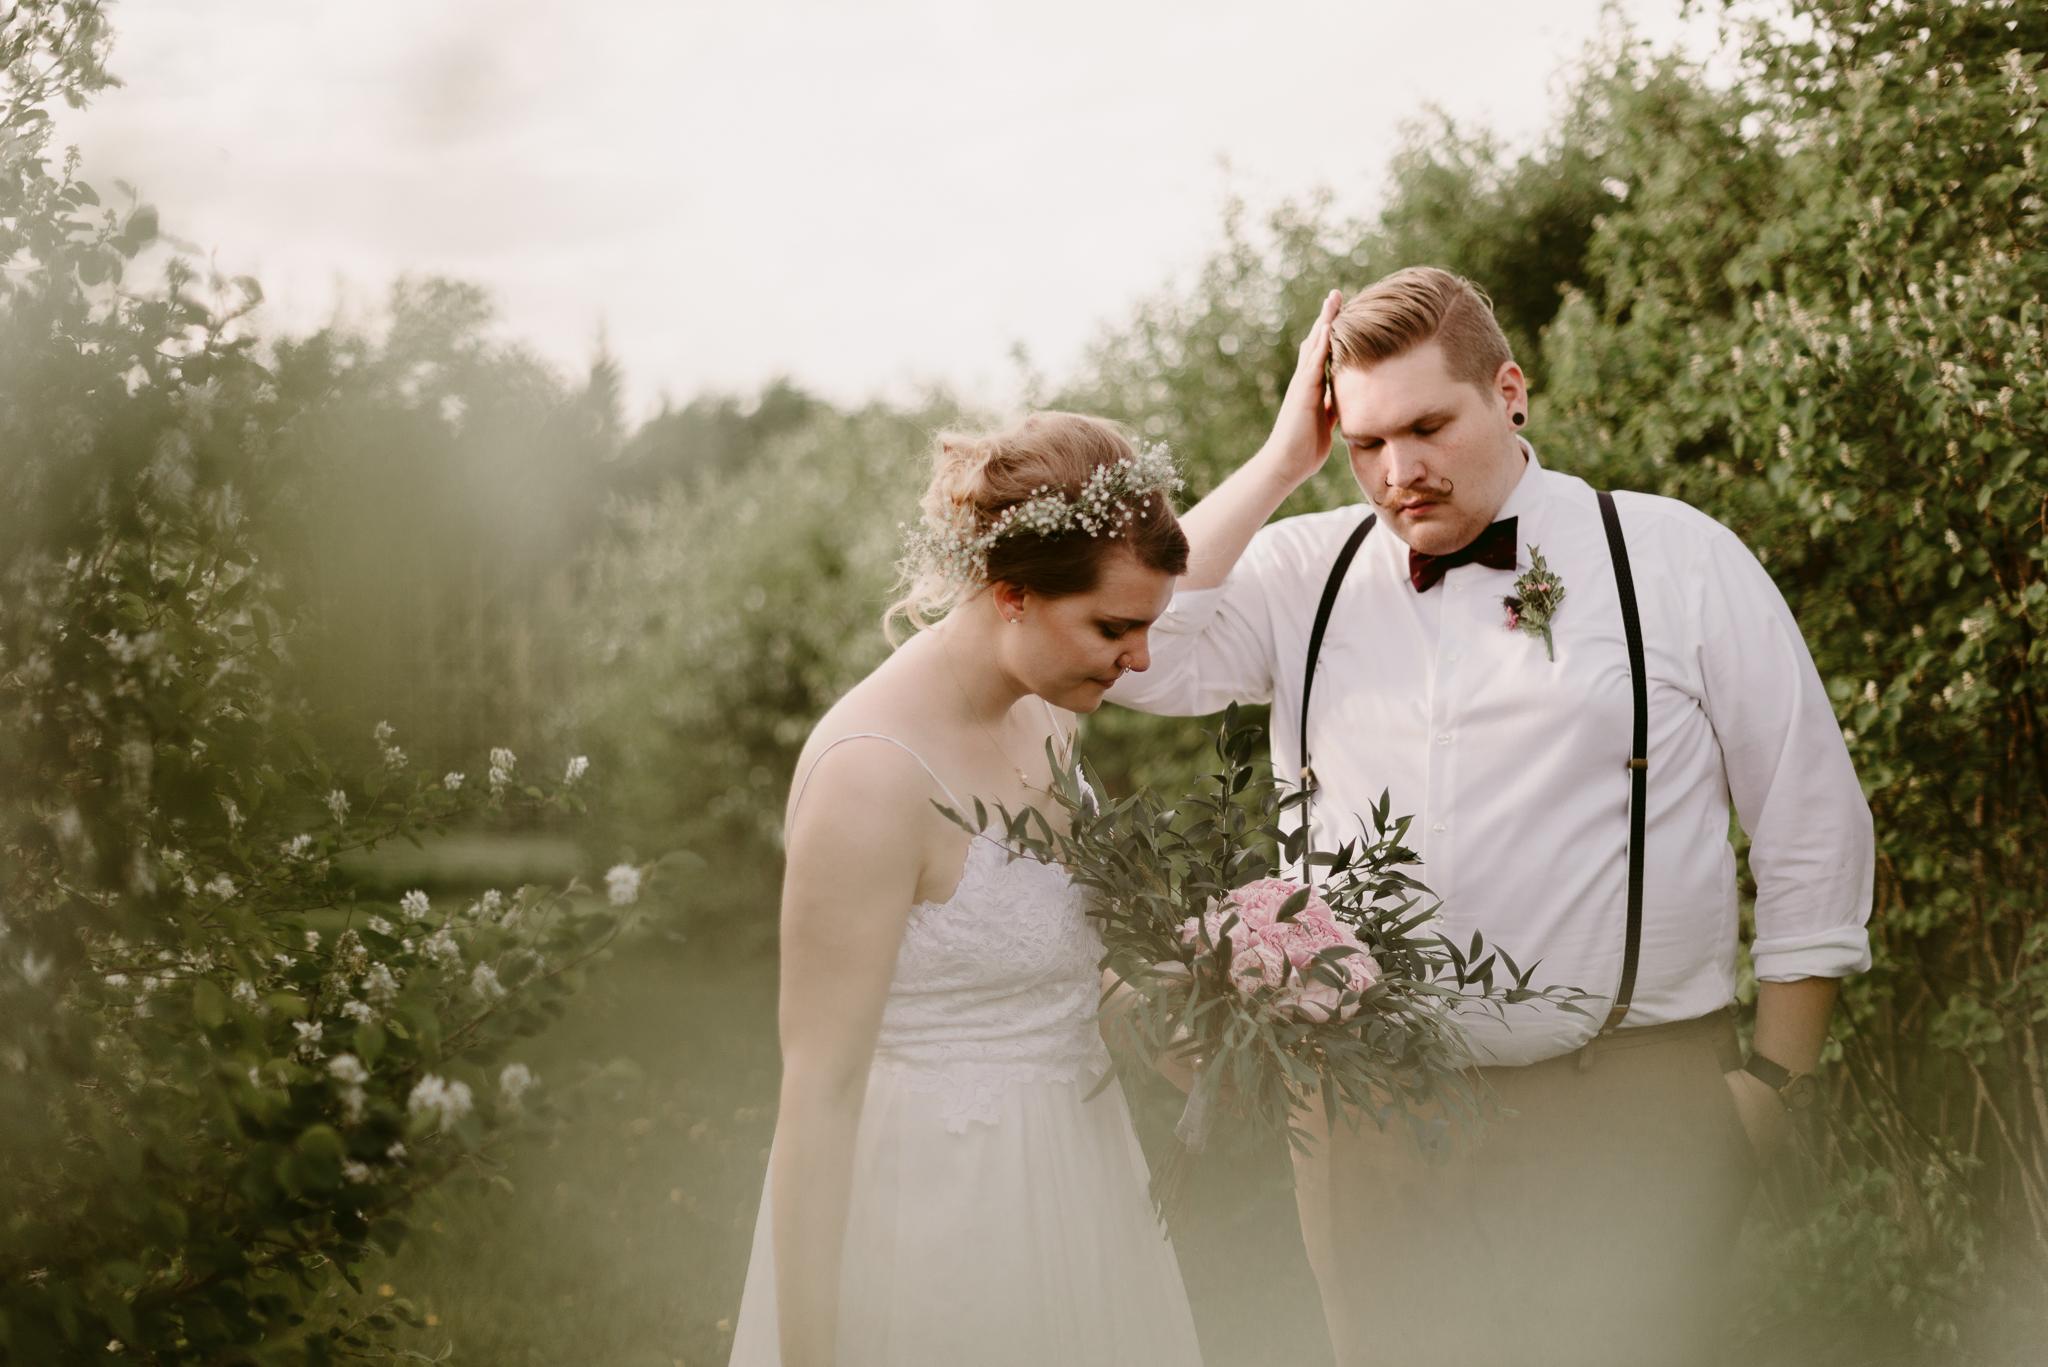 D&P-weddingblog-213.jpg